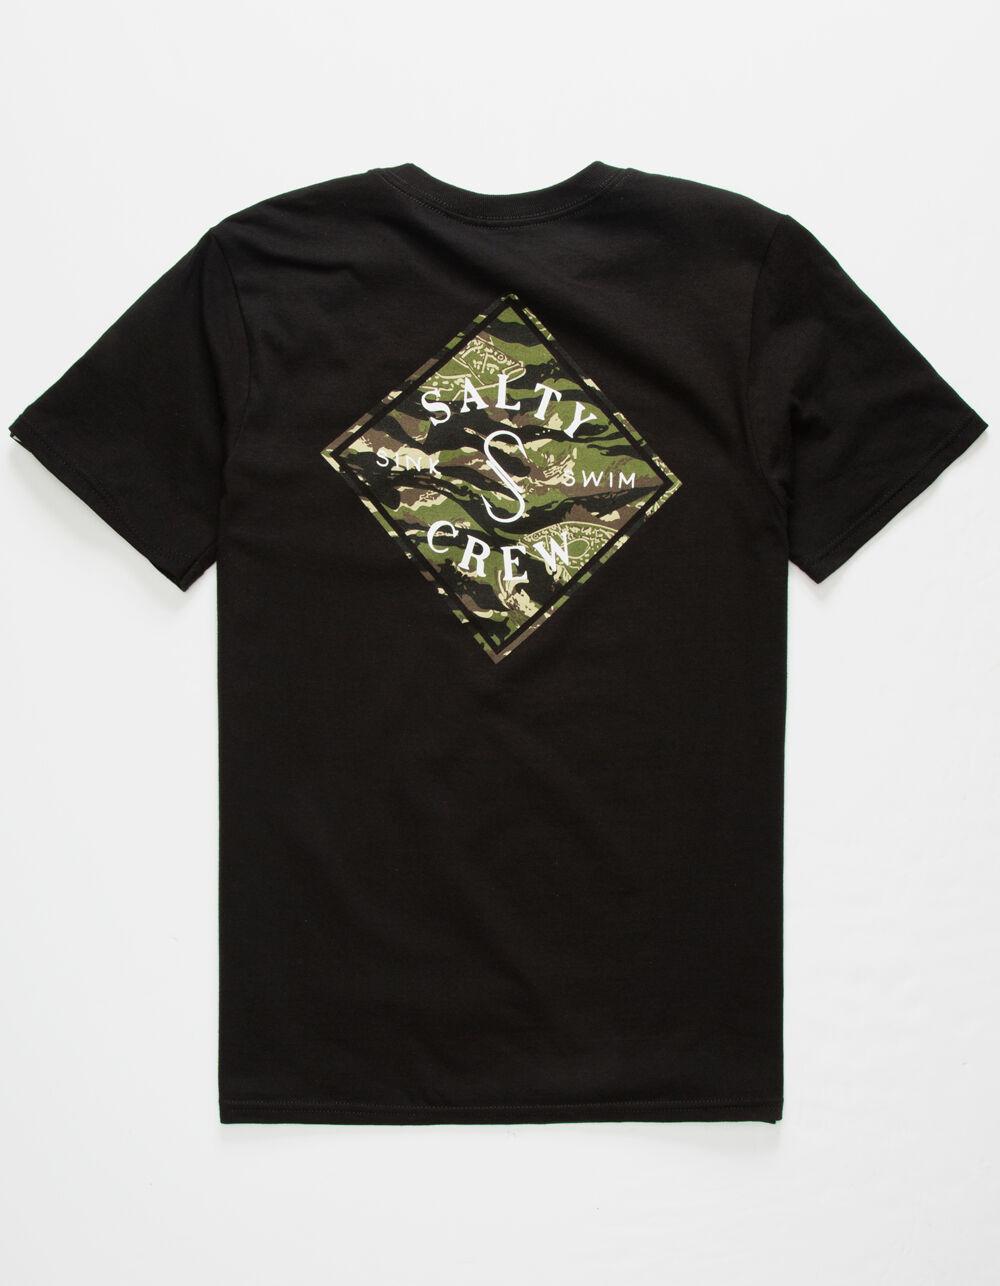 SALTY CREW Tippet Triad Camo Boys T-Shirt